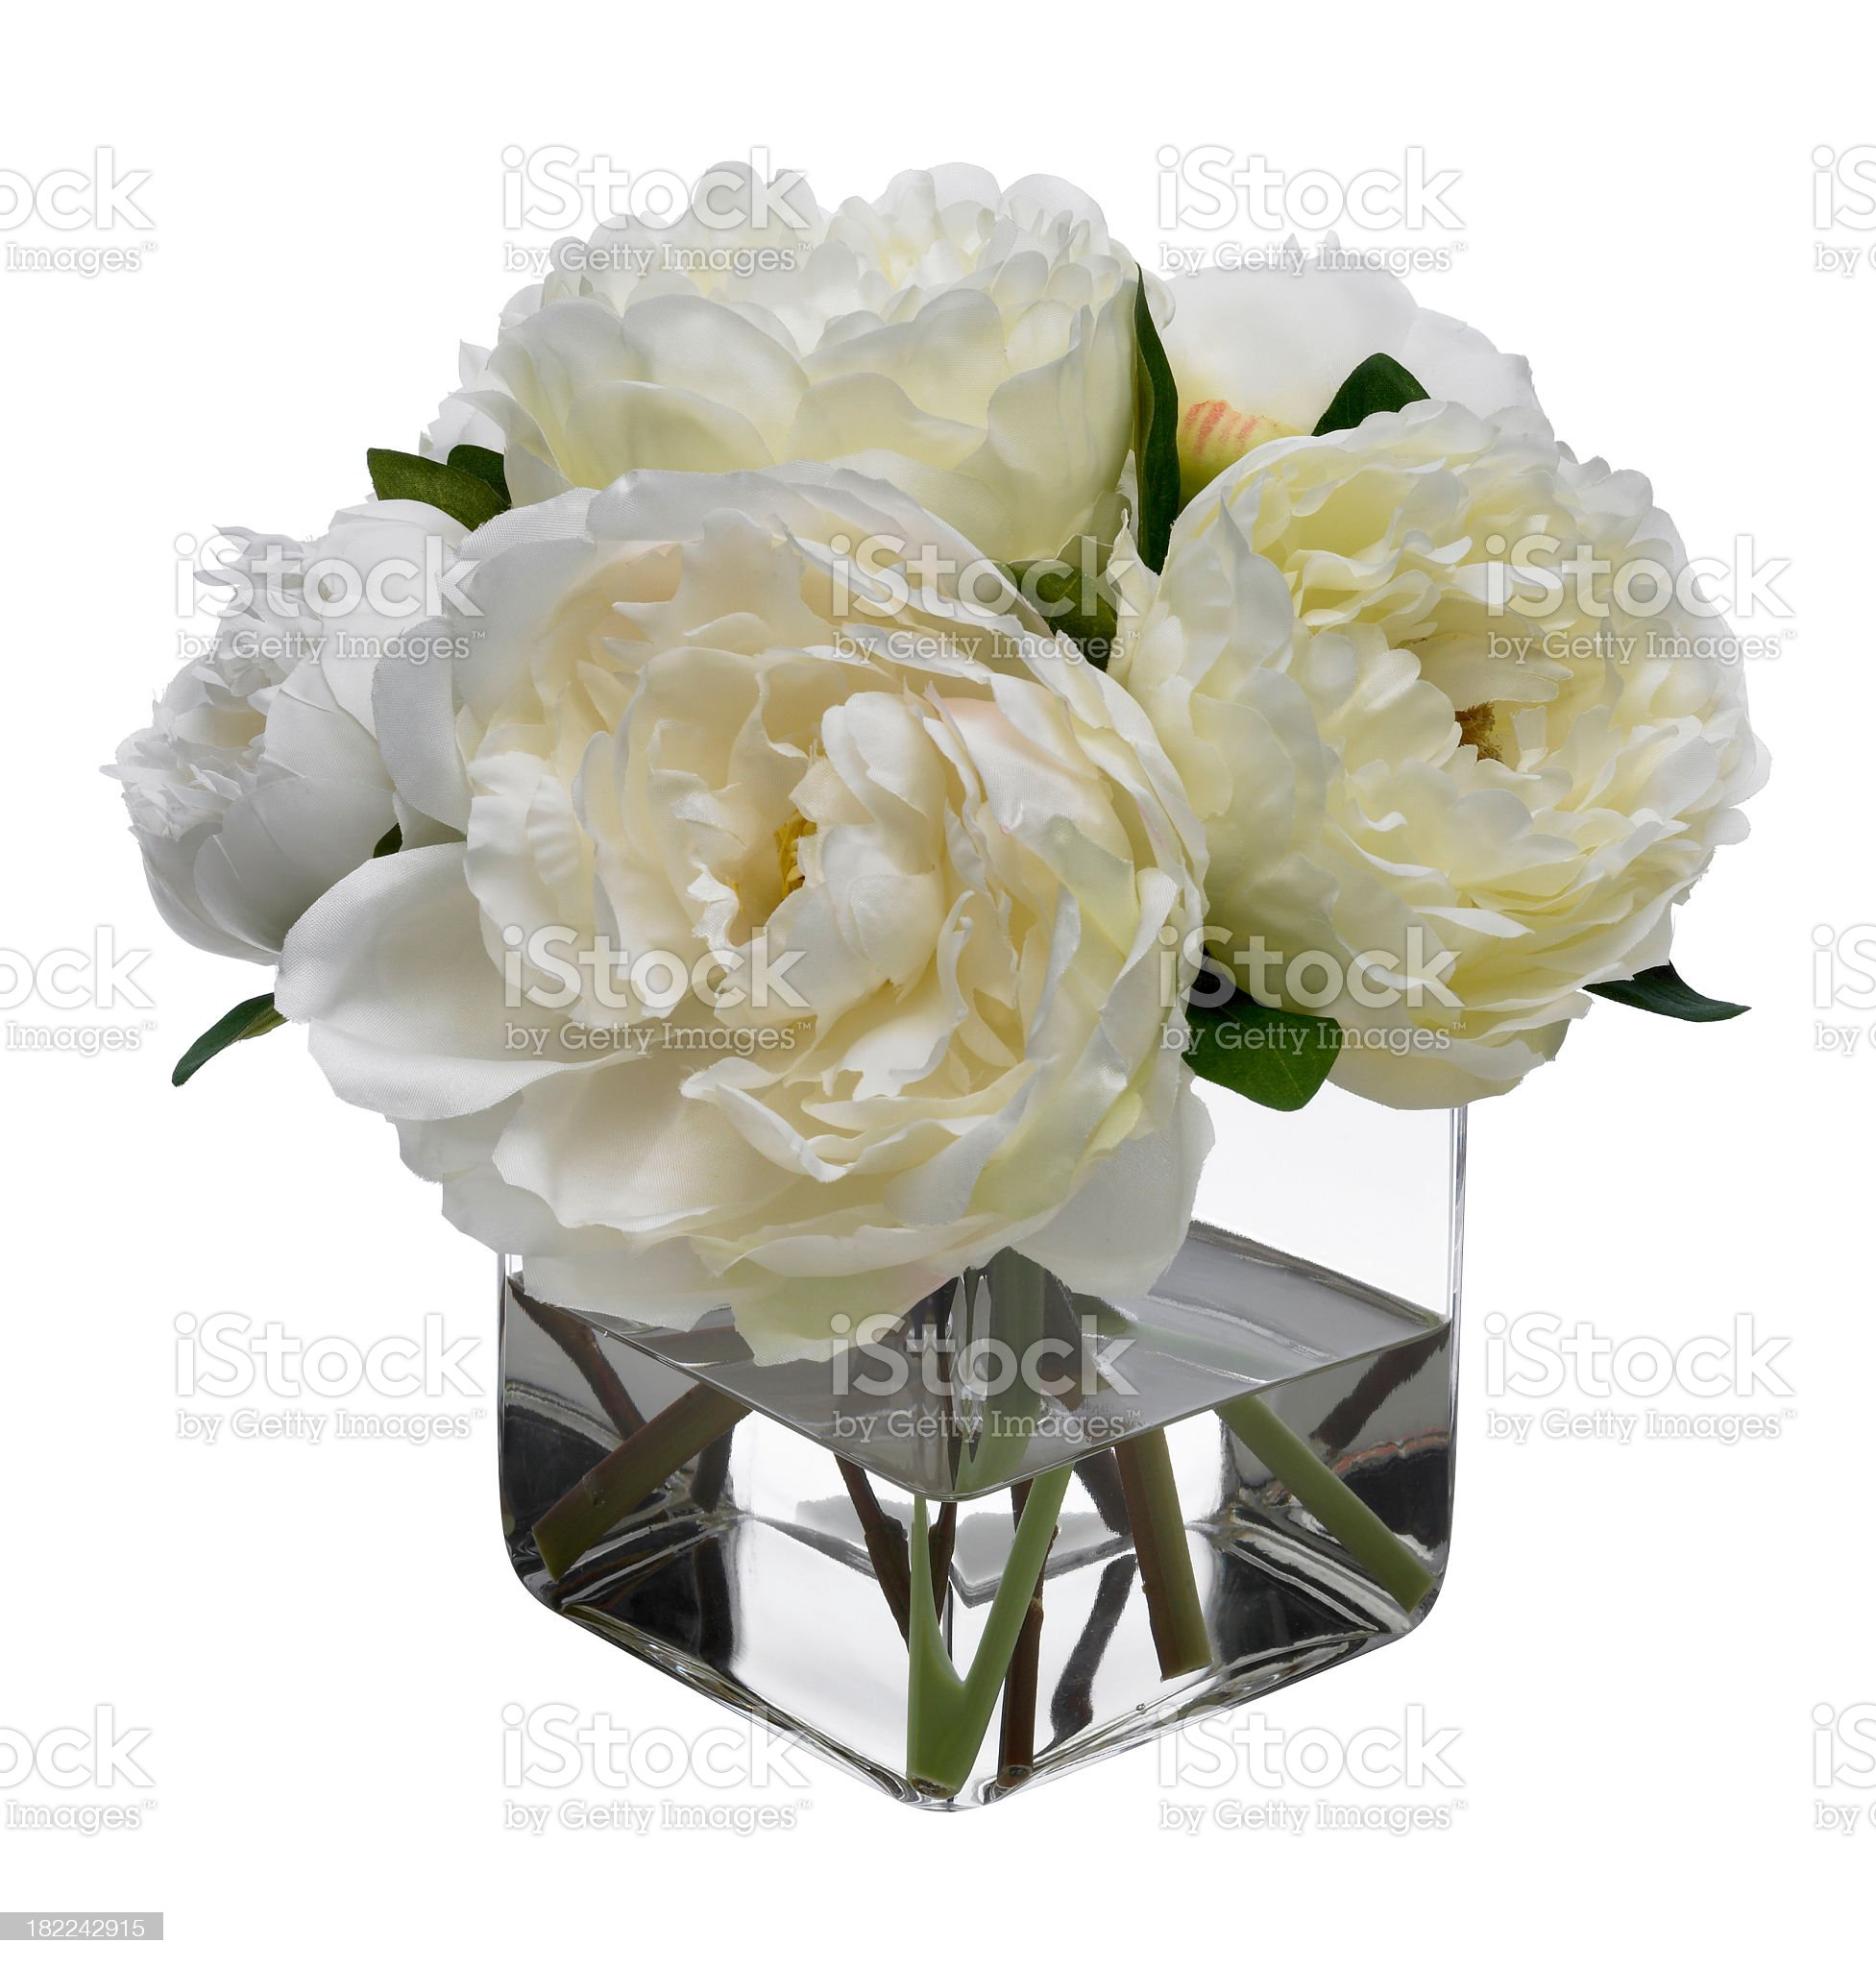 White Peonies on white background royalty-free stock photo